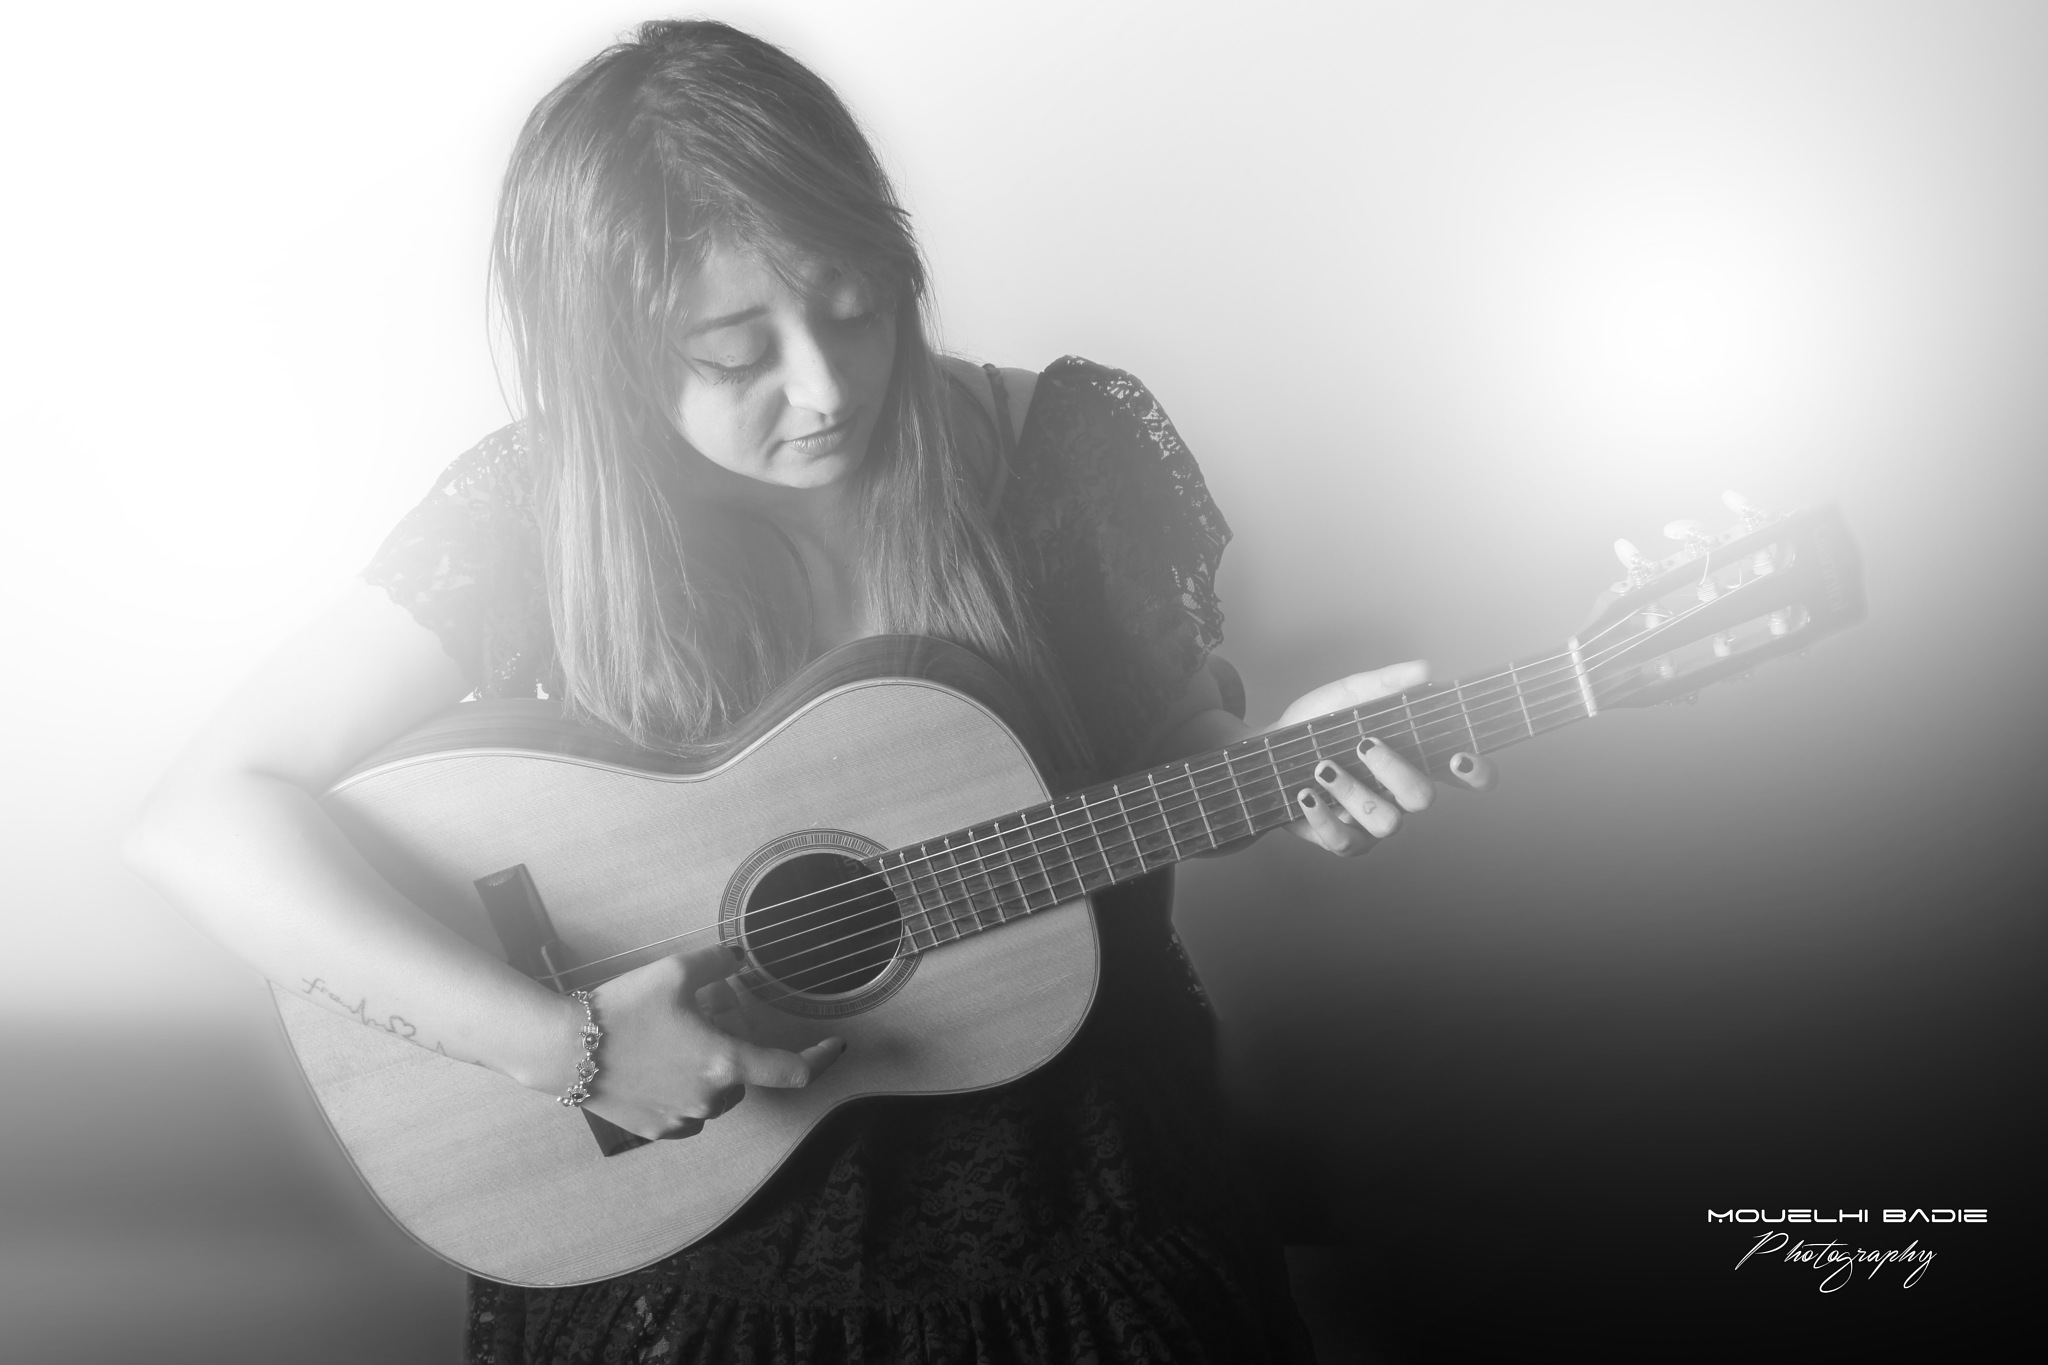 sad guitar by Mouelhi Badie